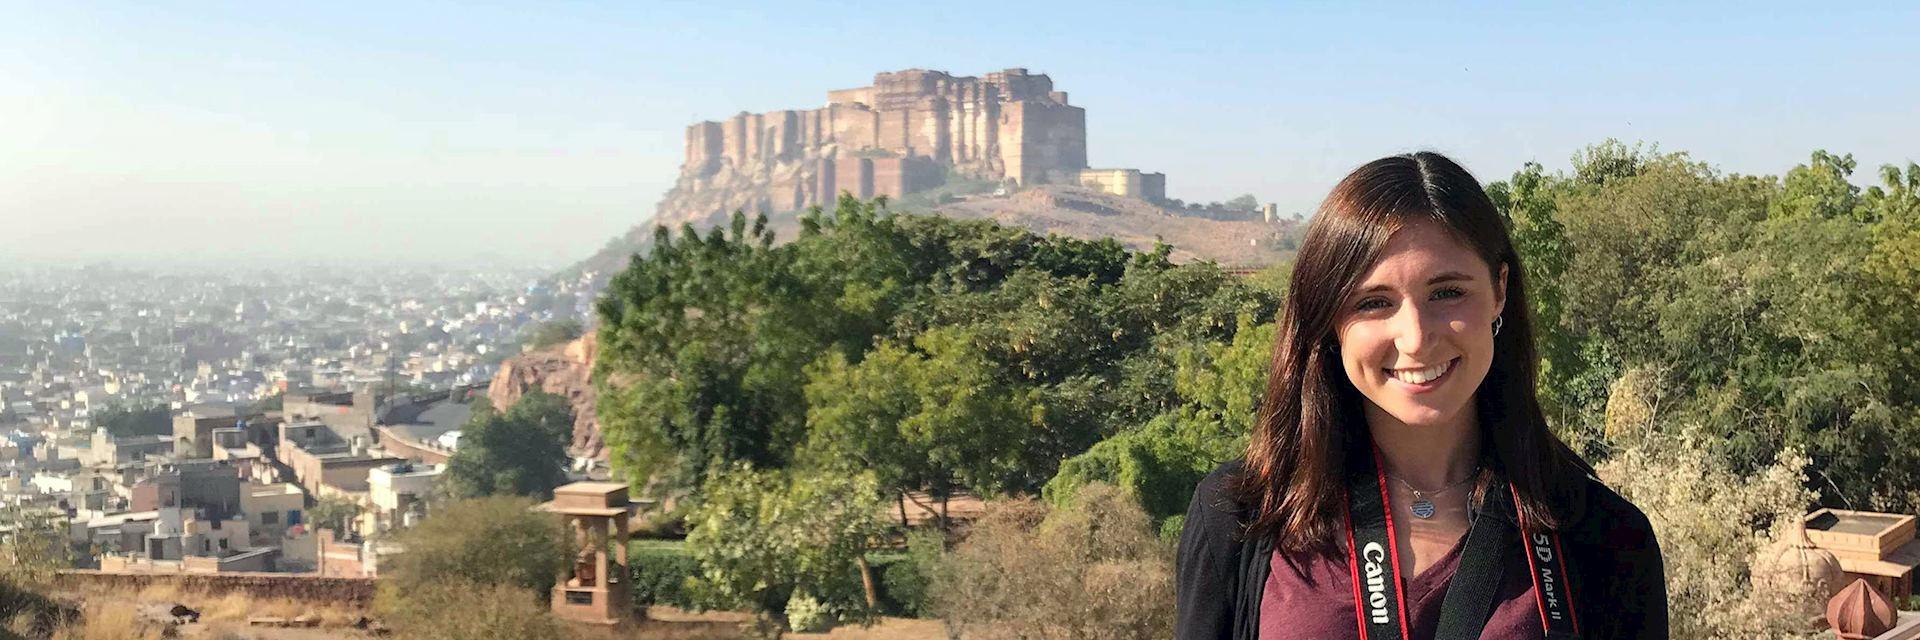 Lydia visiting Jodhpur, India